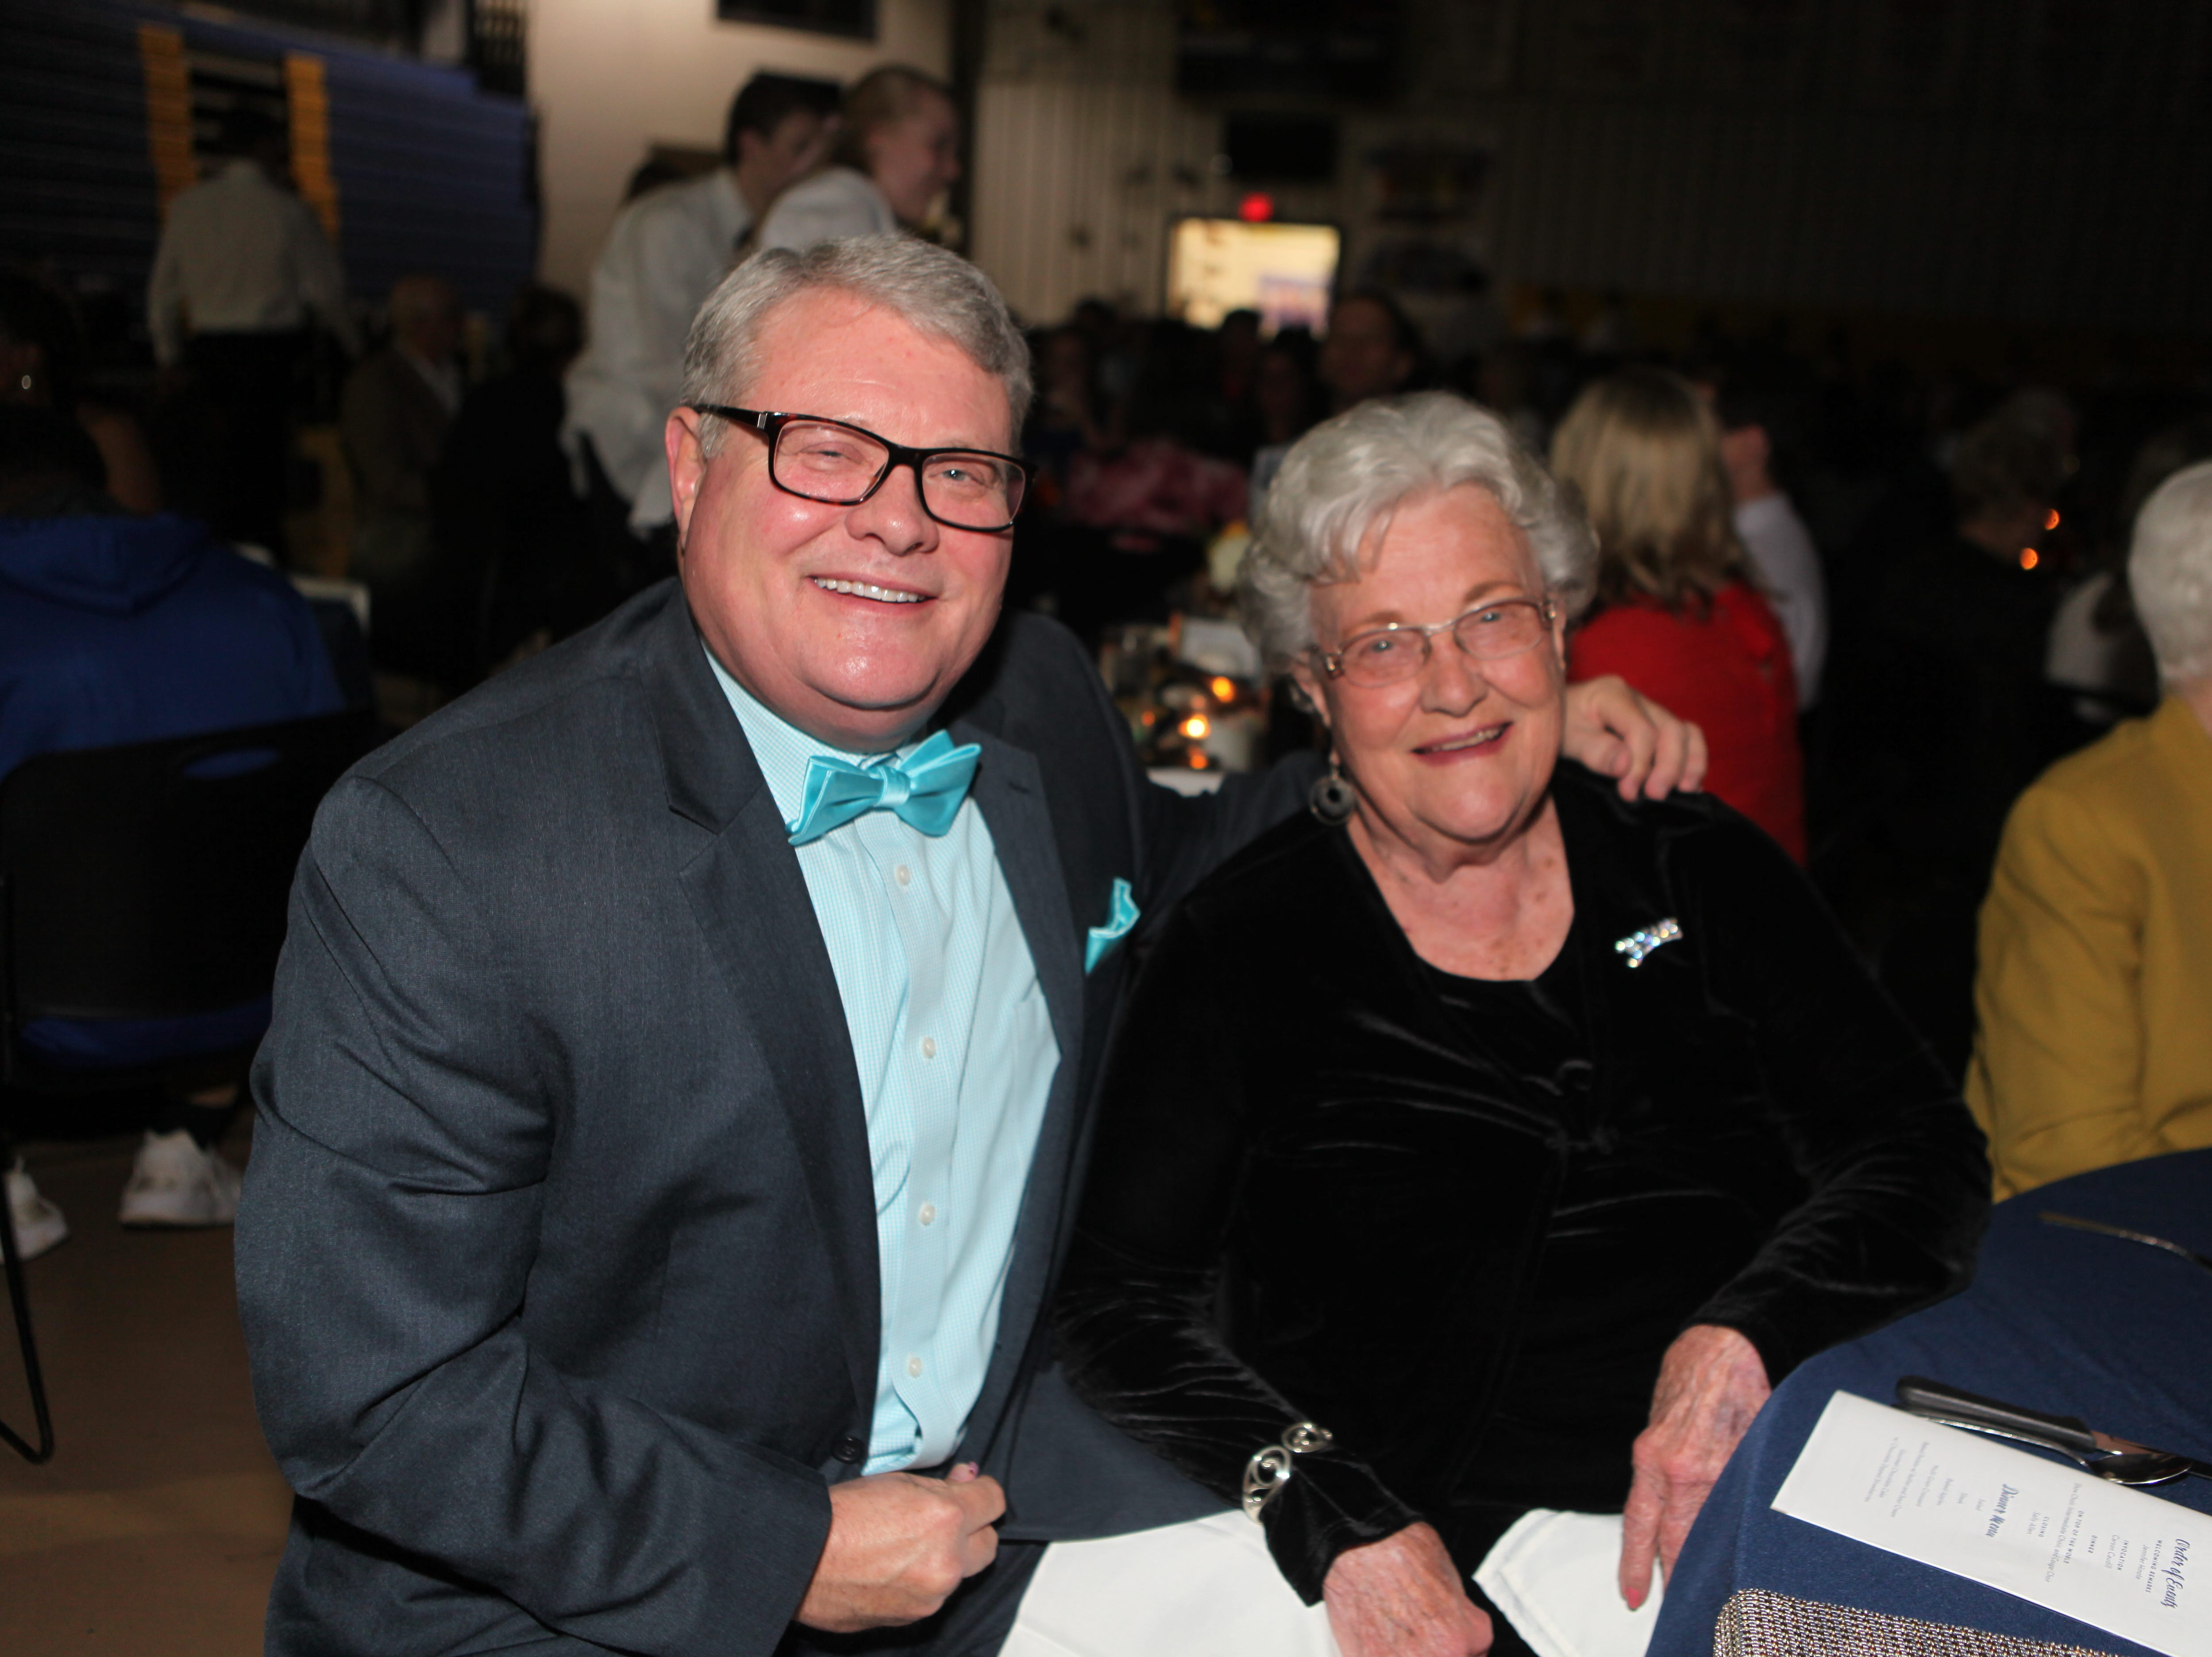 Wally and Wanda Burchett at Clarksville Academy's Steak Dinner on Saturday, April 13, 2019.